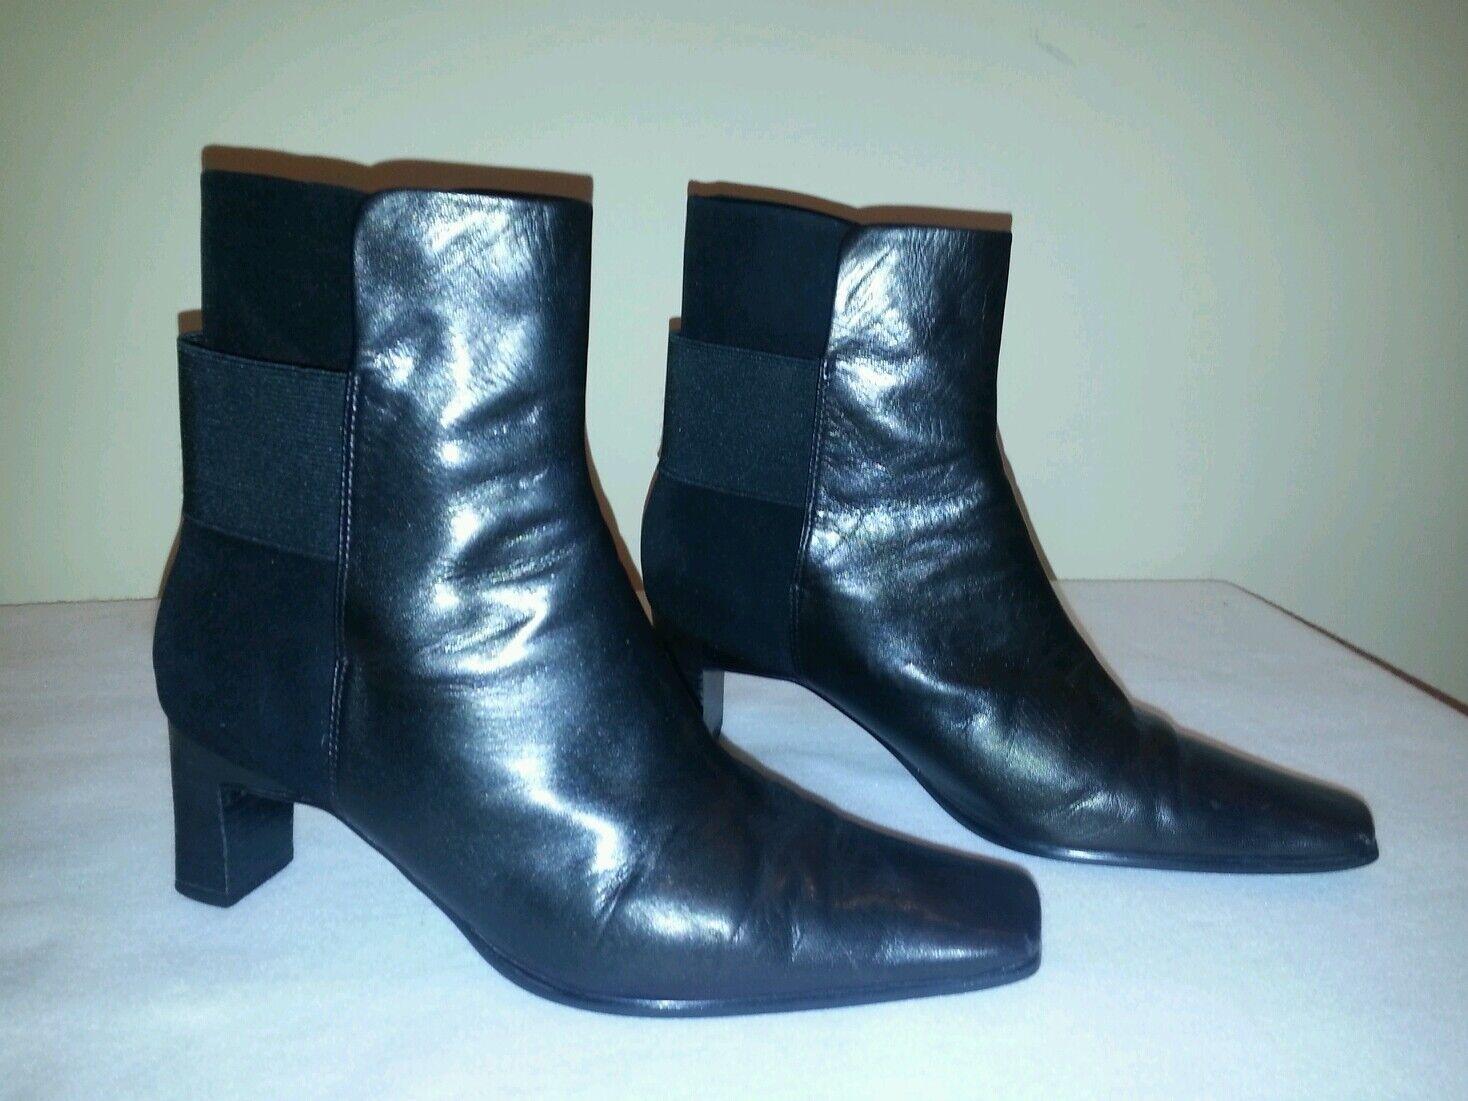 J. Renee black genuine leather ankle boots, elastic back, 7.5M